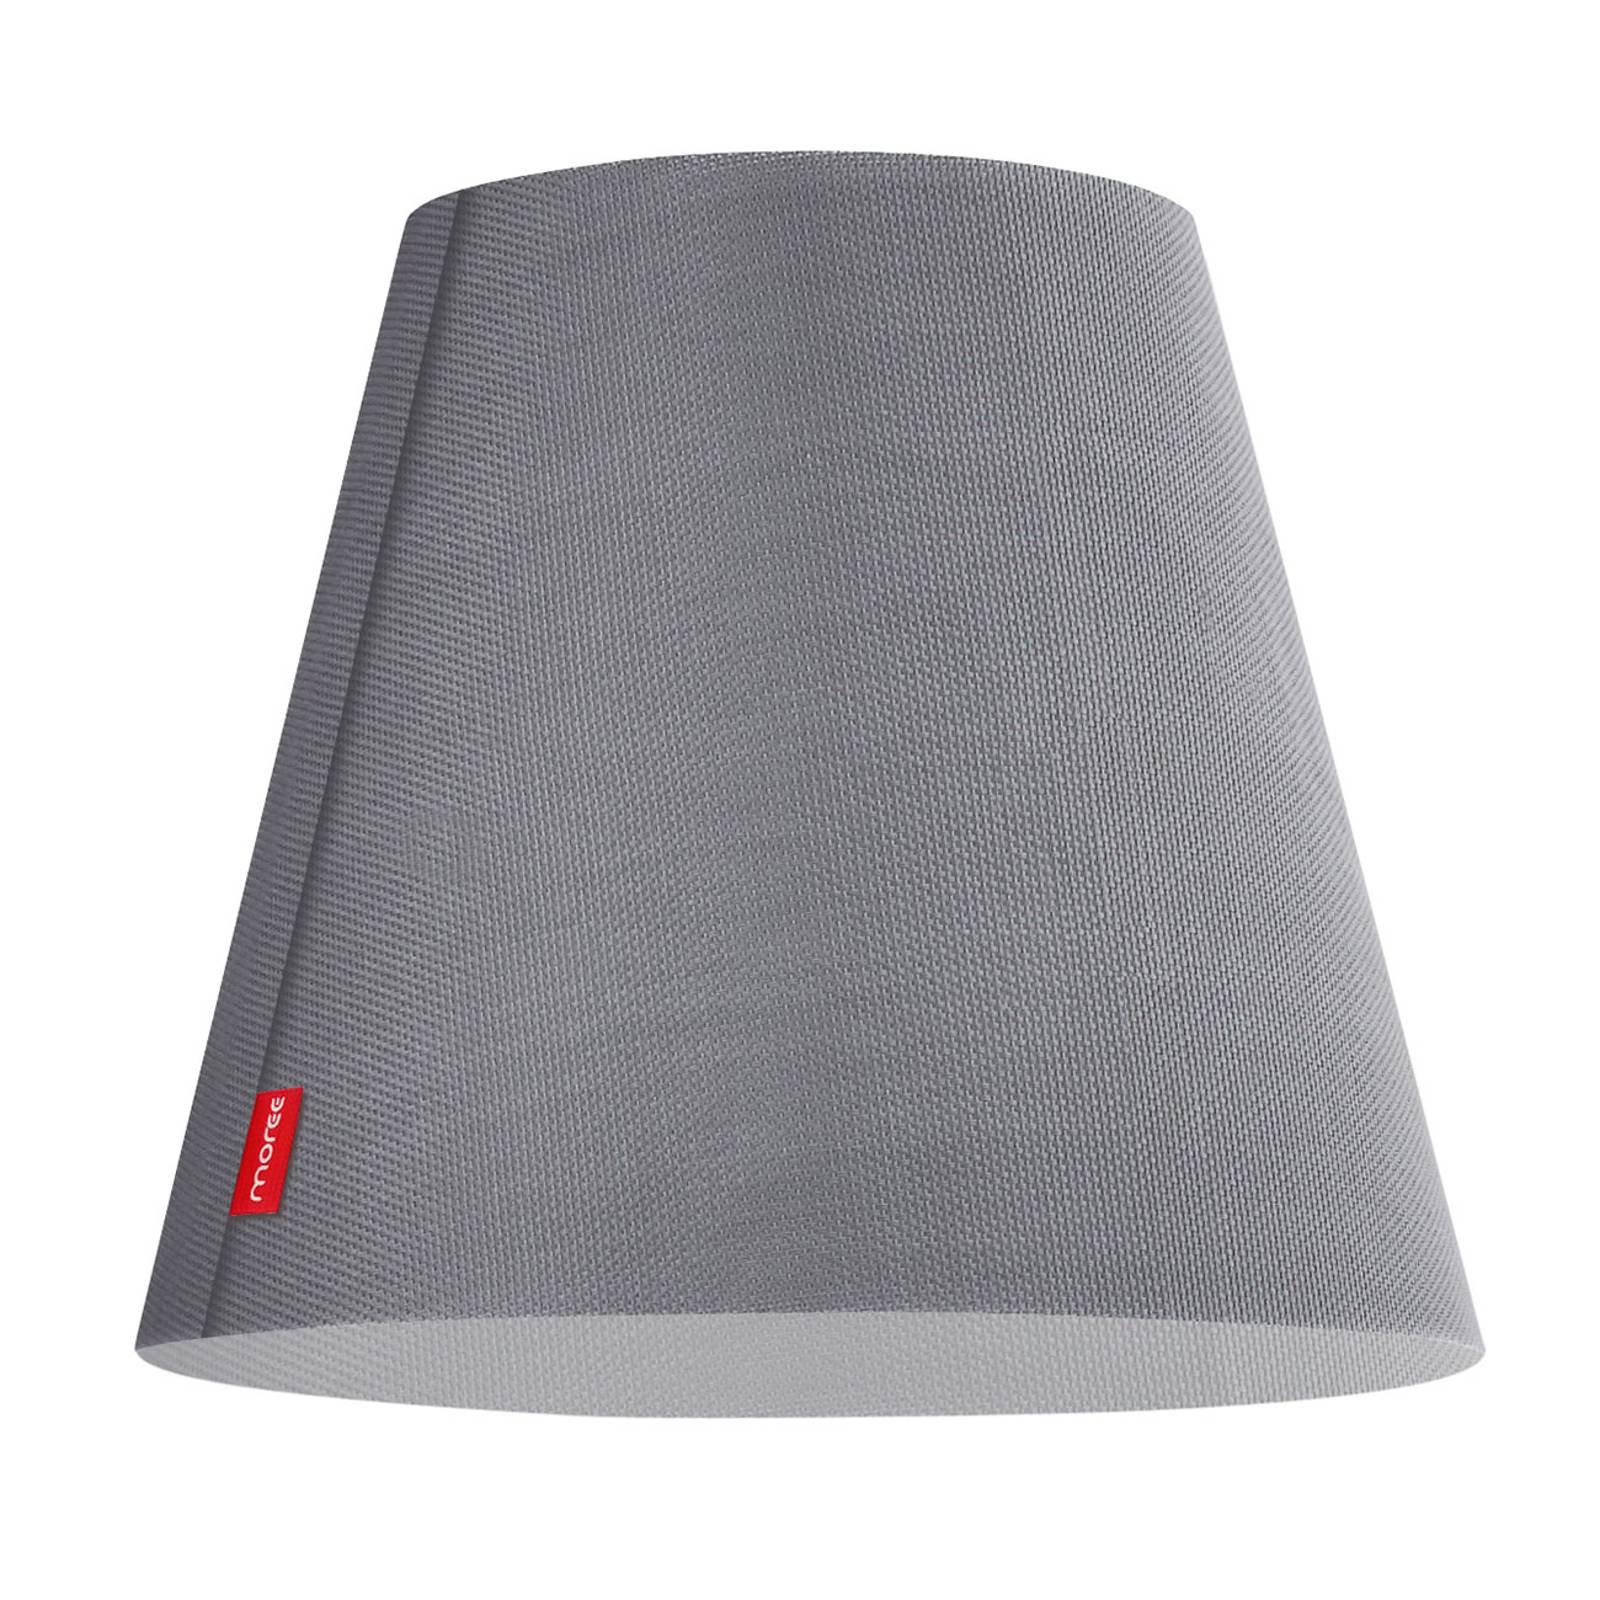 Gulvlampe Swap Outdoor, grå stoffbelagt skjerm